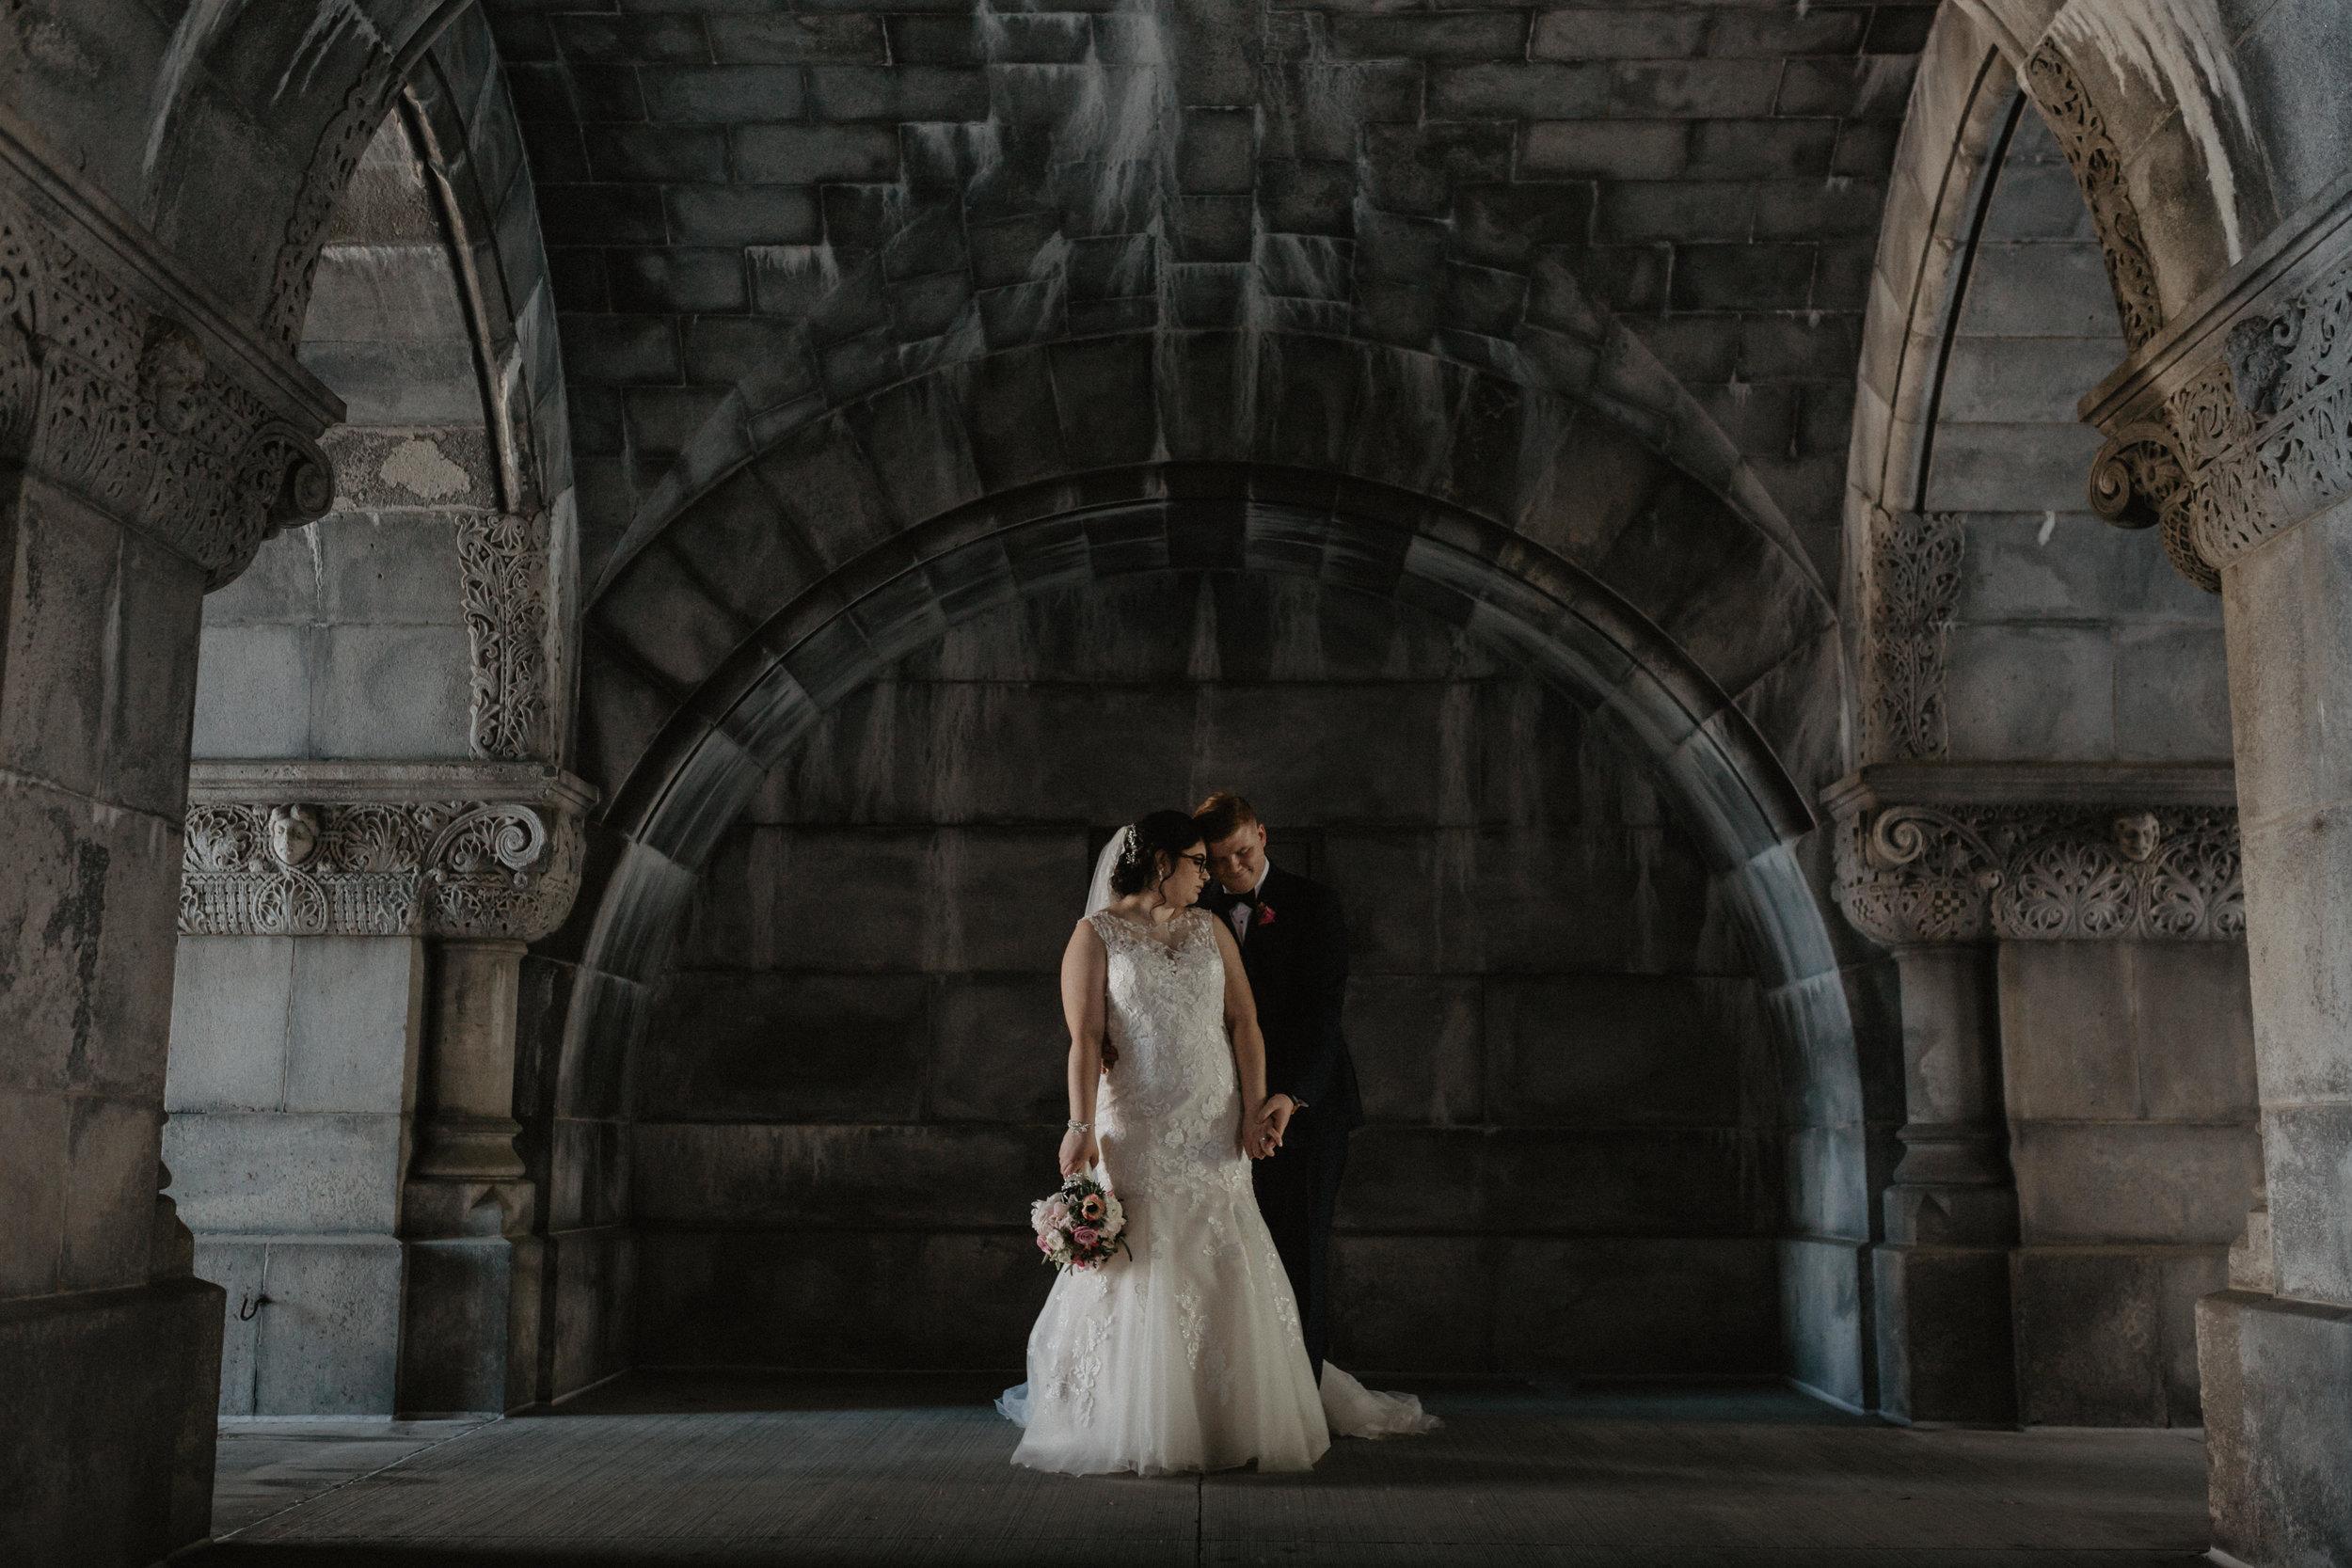 albany-new-york-wedding-36.jpg